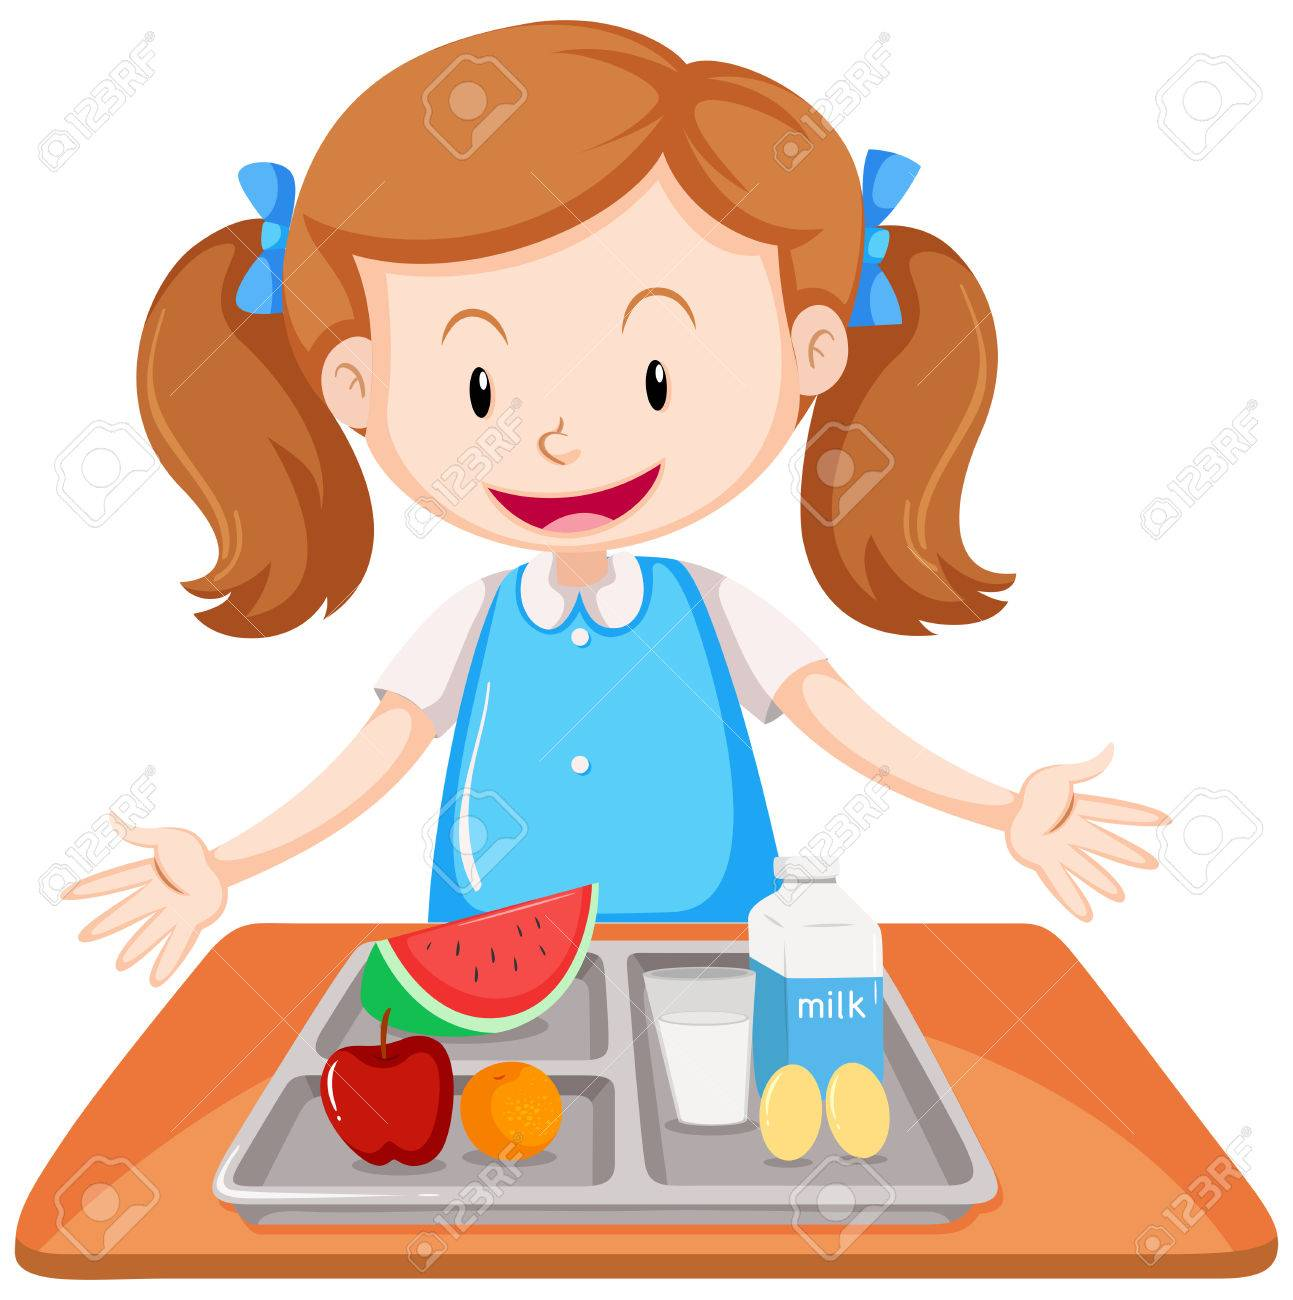 Girl having lunch on table illustration.